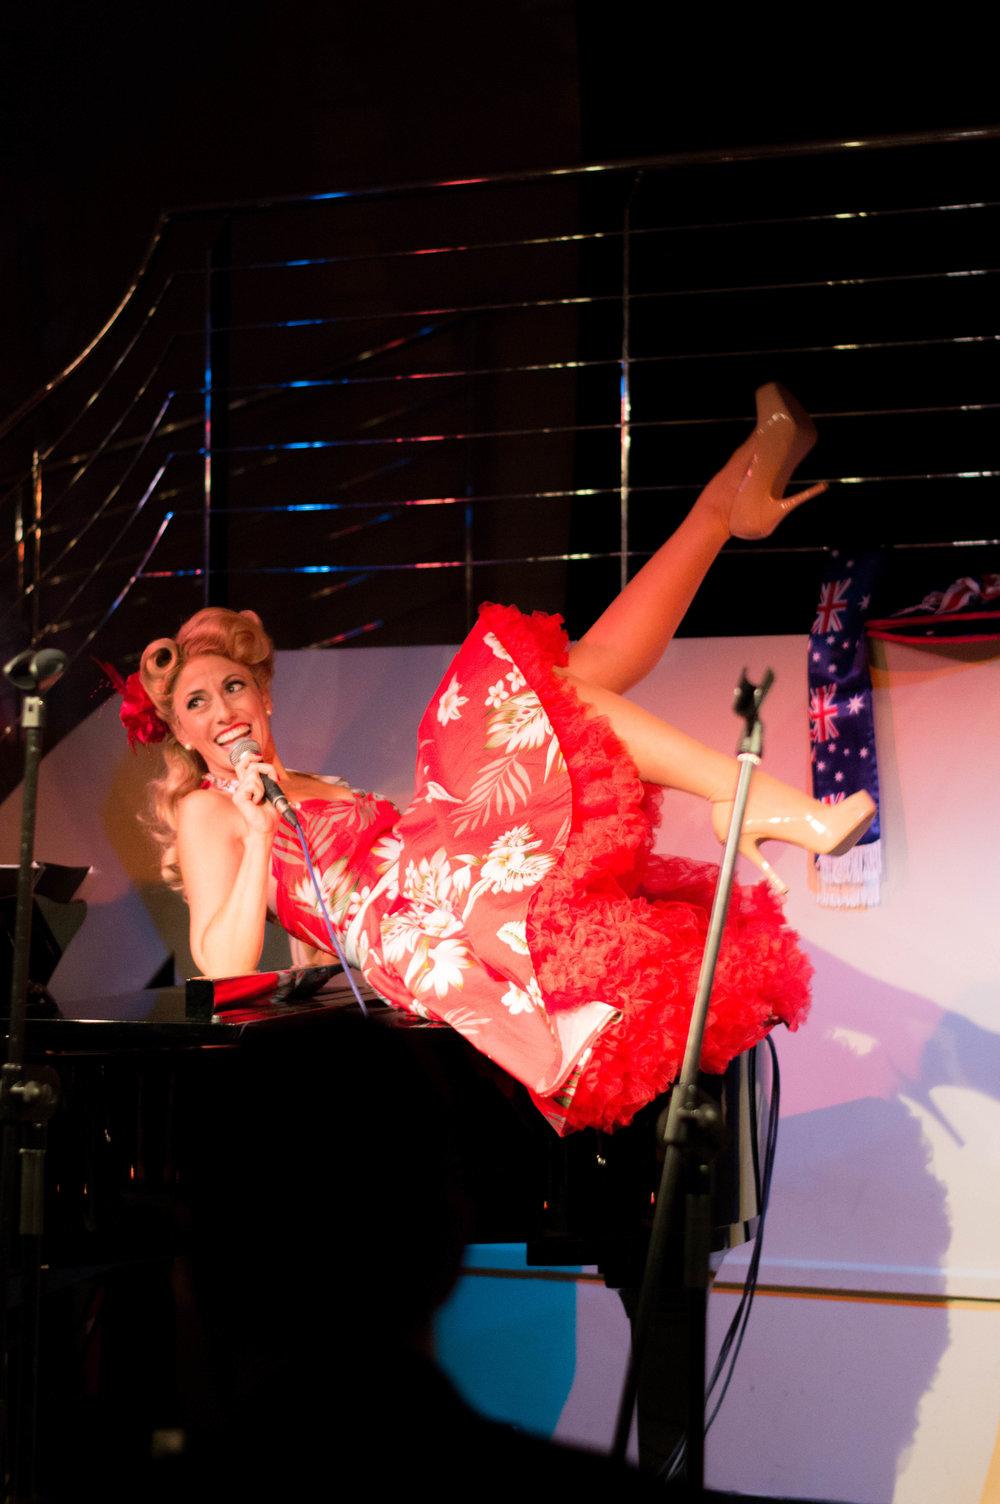 TheGirlsFromOzGroup@gmail.com Australia Day Live.jpg